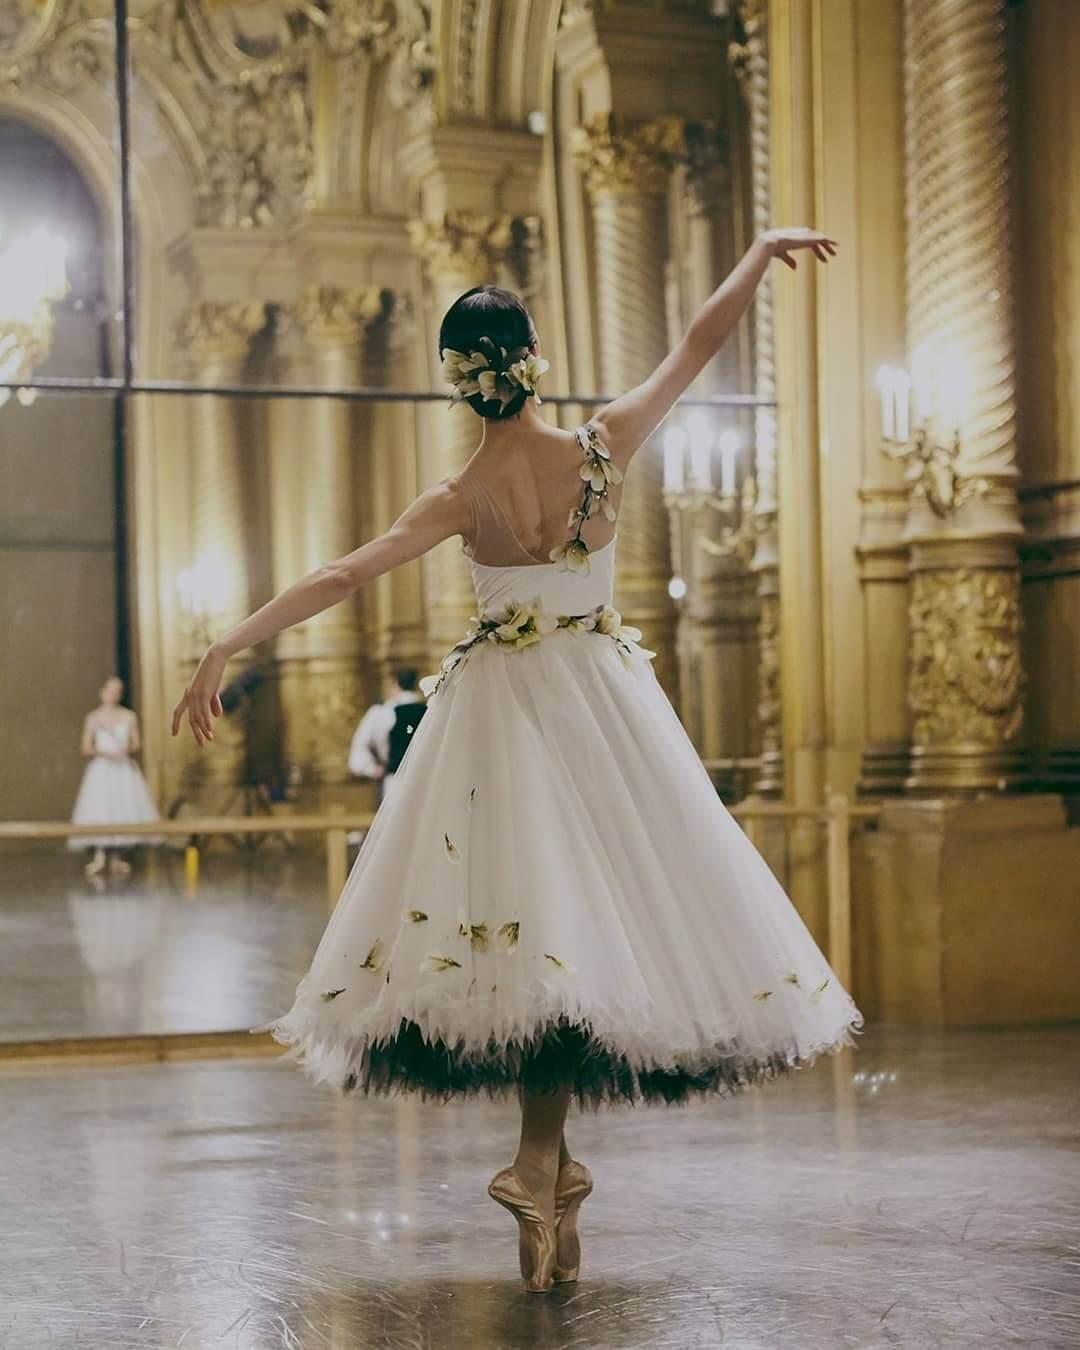 Virginie Viard上場後亦連續兩年贊助巴黎歌劇院新舞季開幕之夜,並以CHANEL旗下工藝坊Lemarié為芭蕾舞劇''Variations'' 製作高級訂製服級數的舞衣。